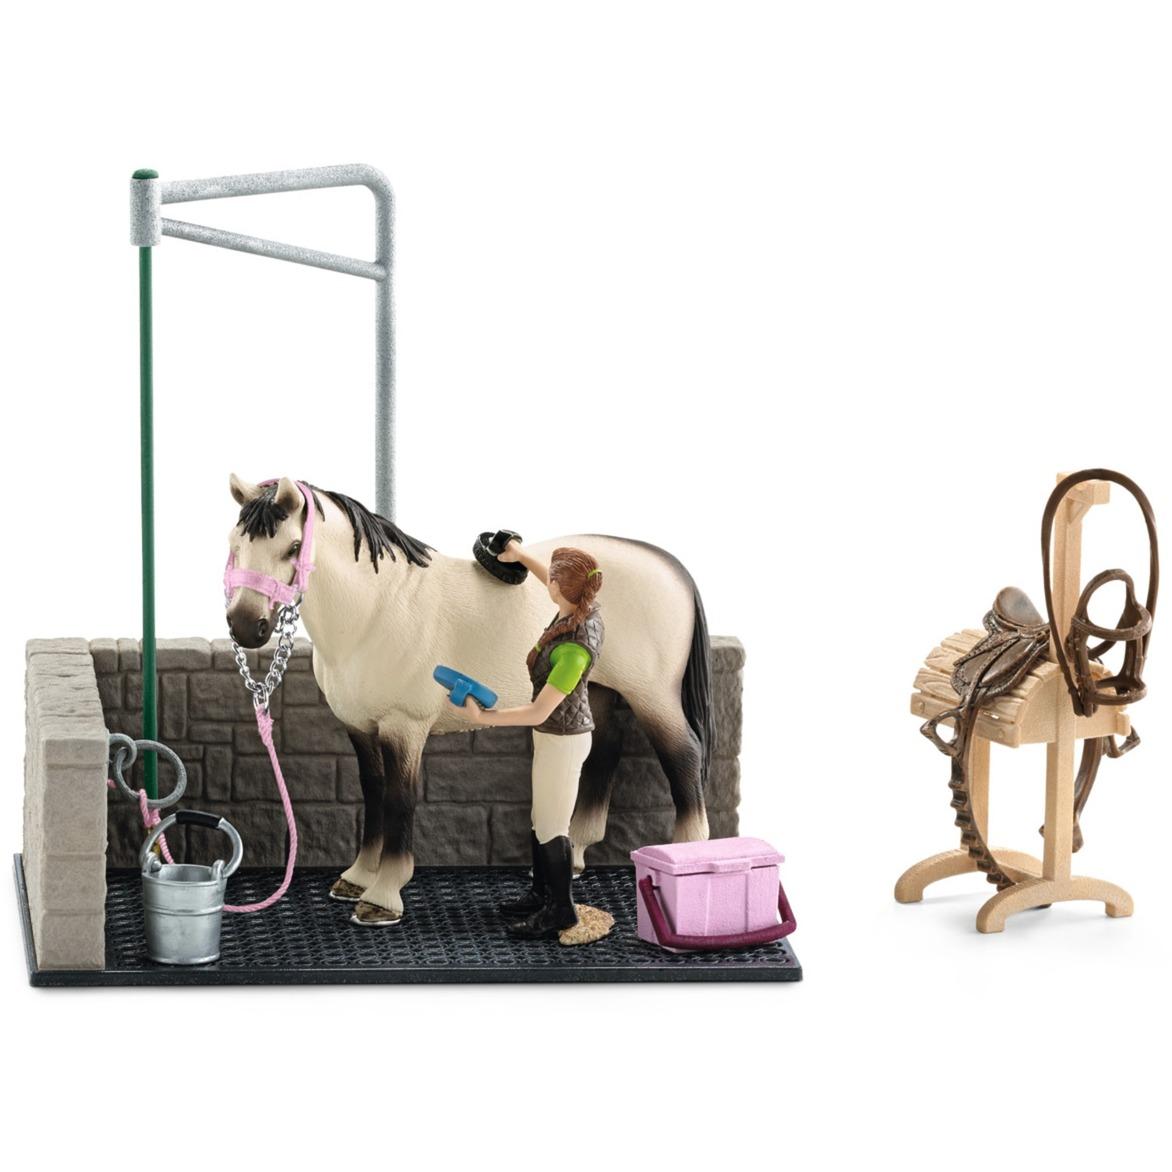 horse-wash-area-spil-figur